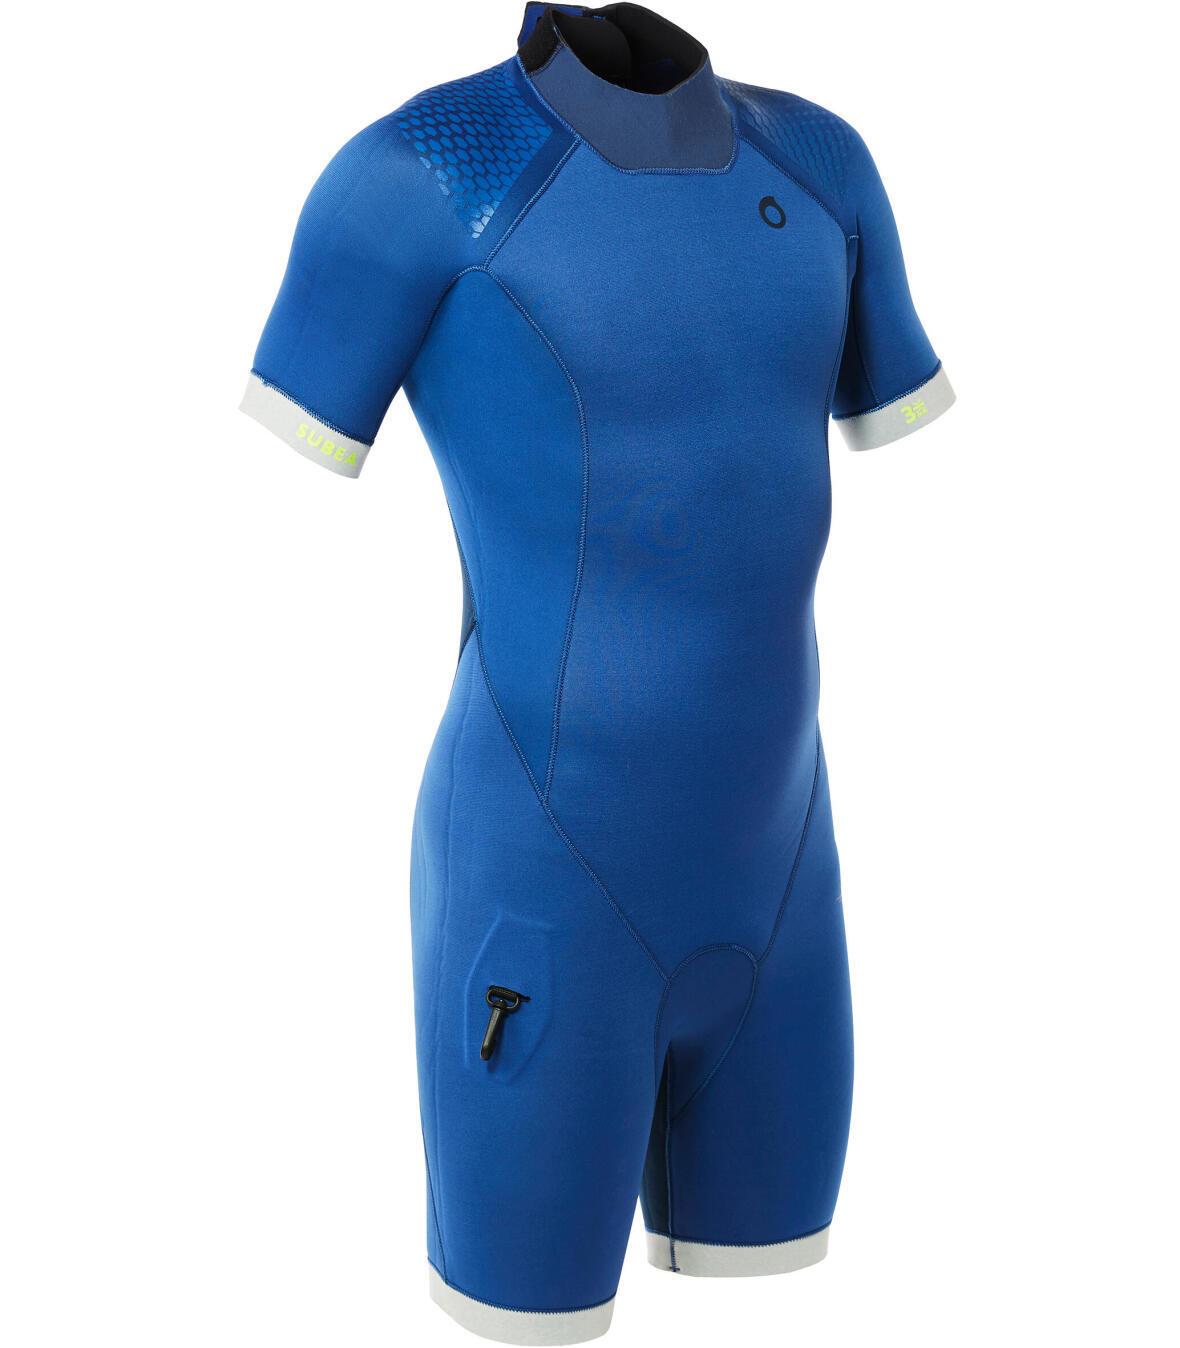 scd 500 3mm m diving shorty blue[8491784]tci_pshot_001-2